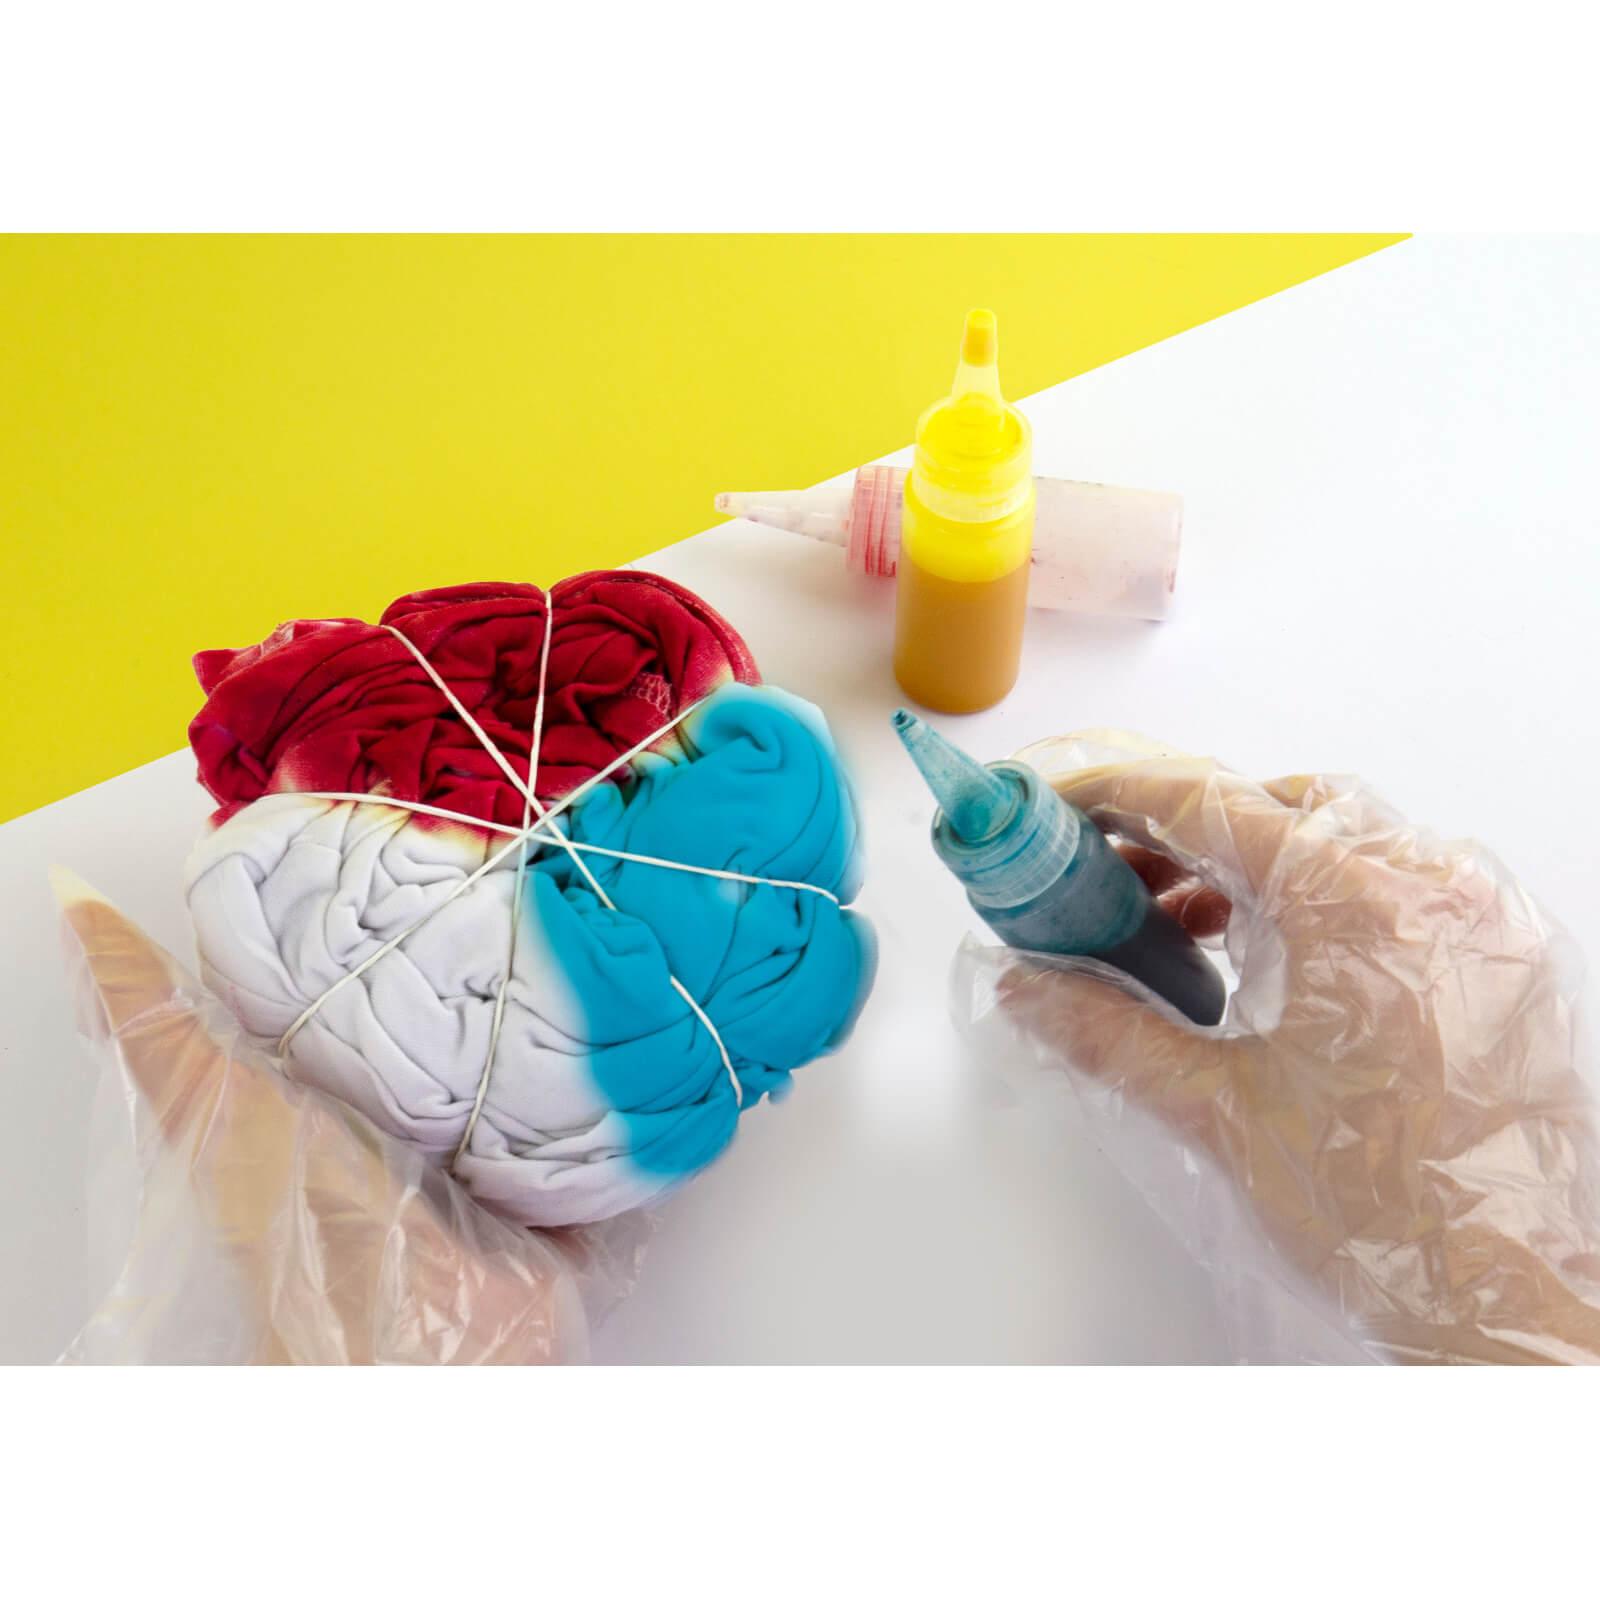 Image of Tie Dye - DIY Kit